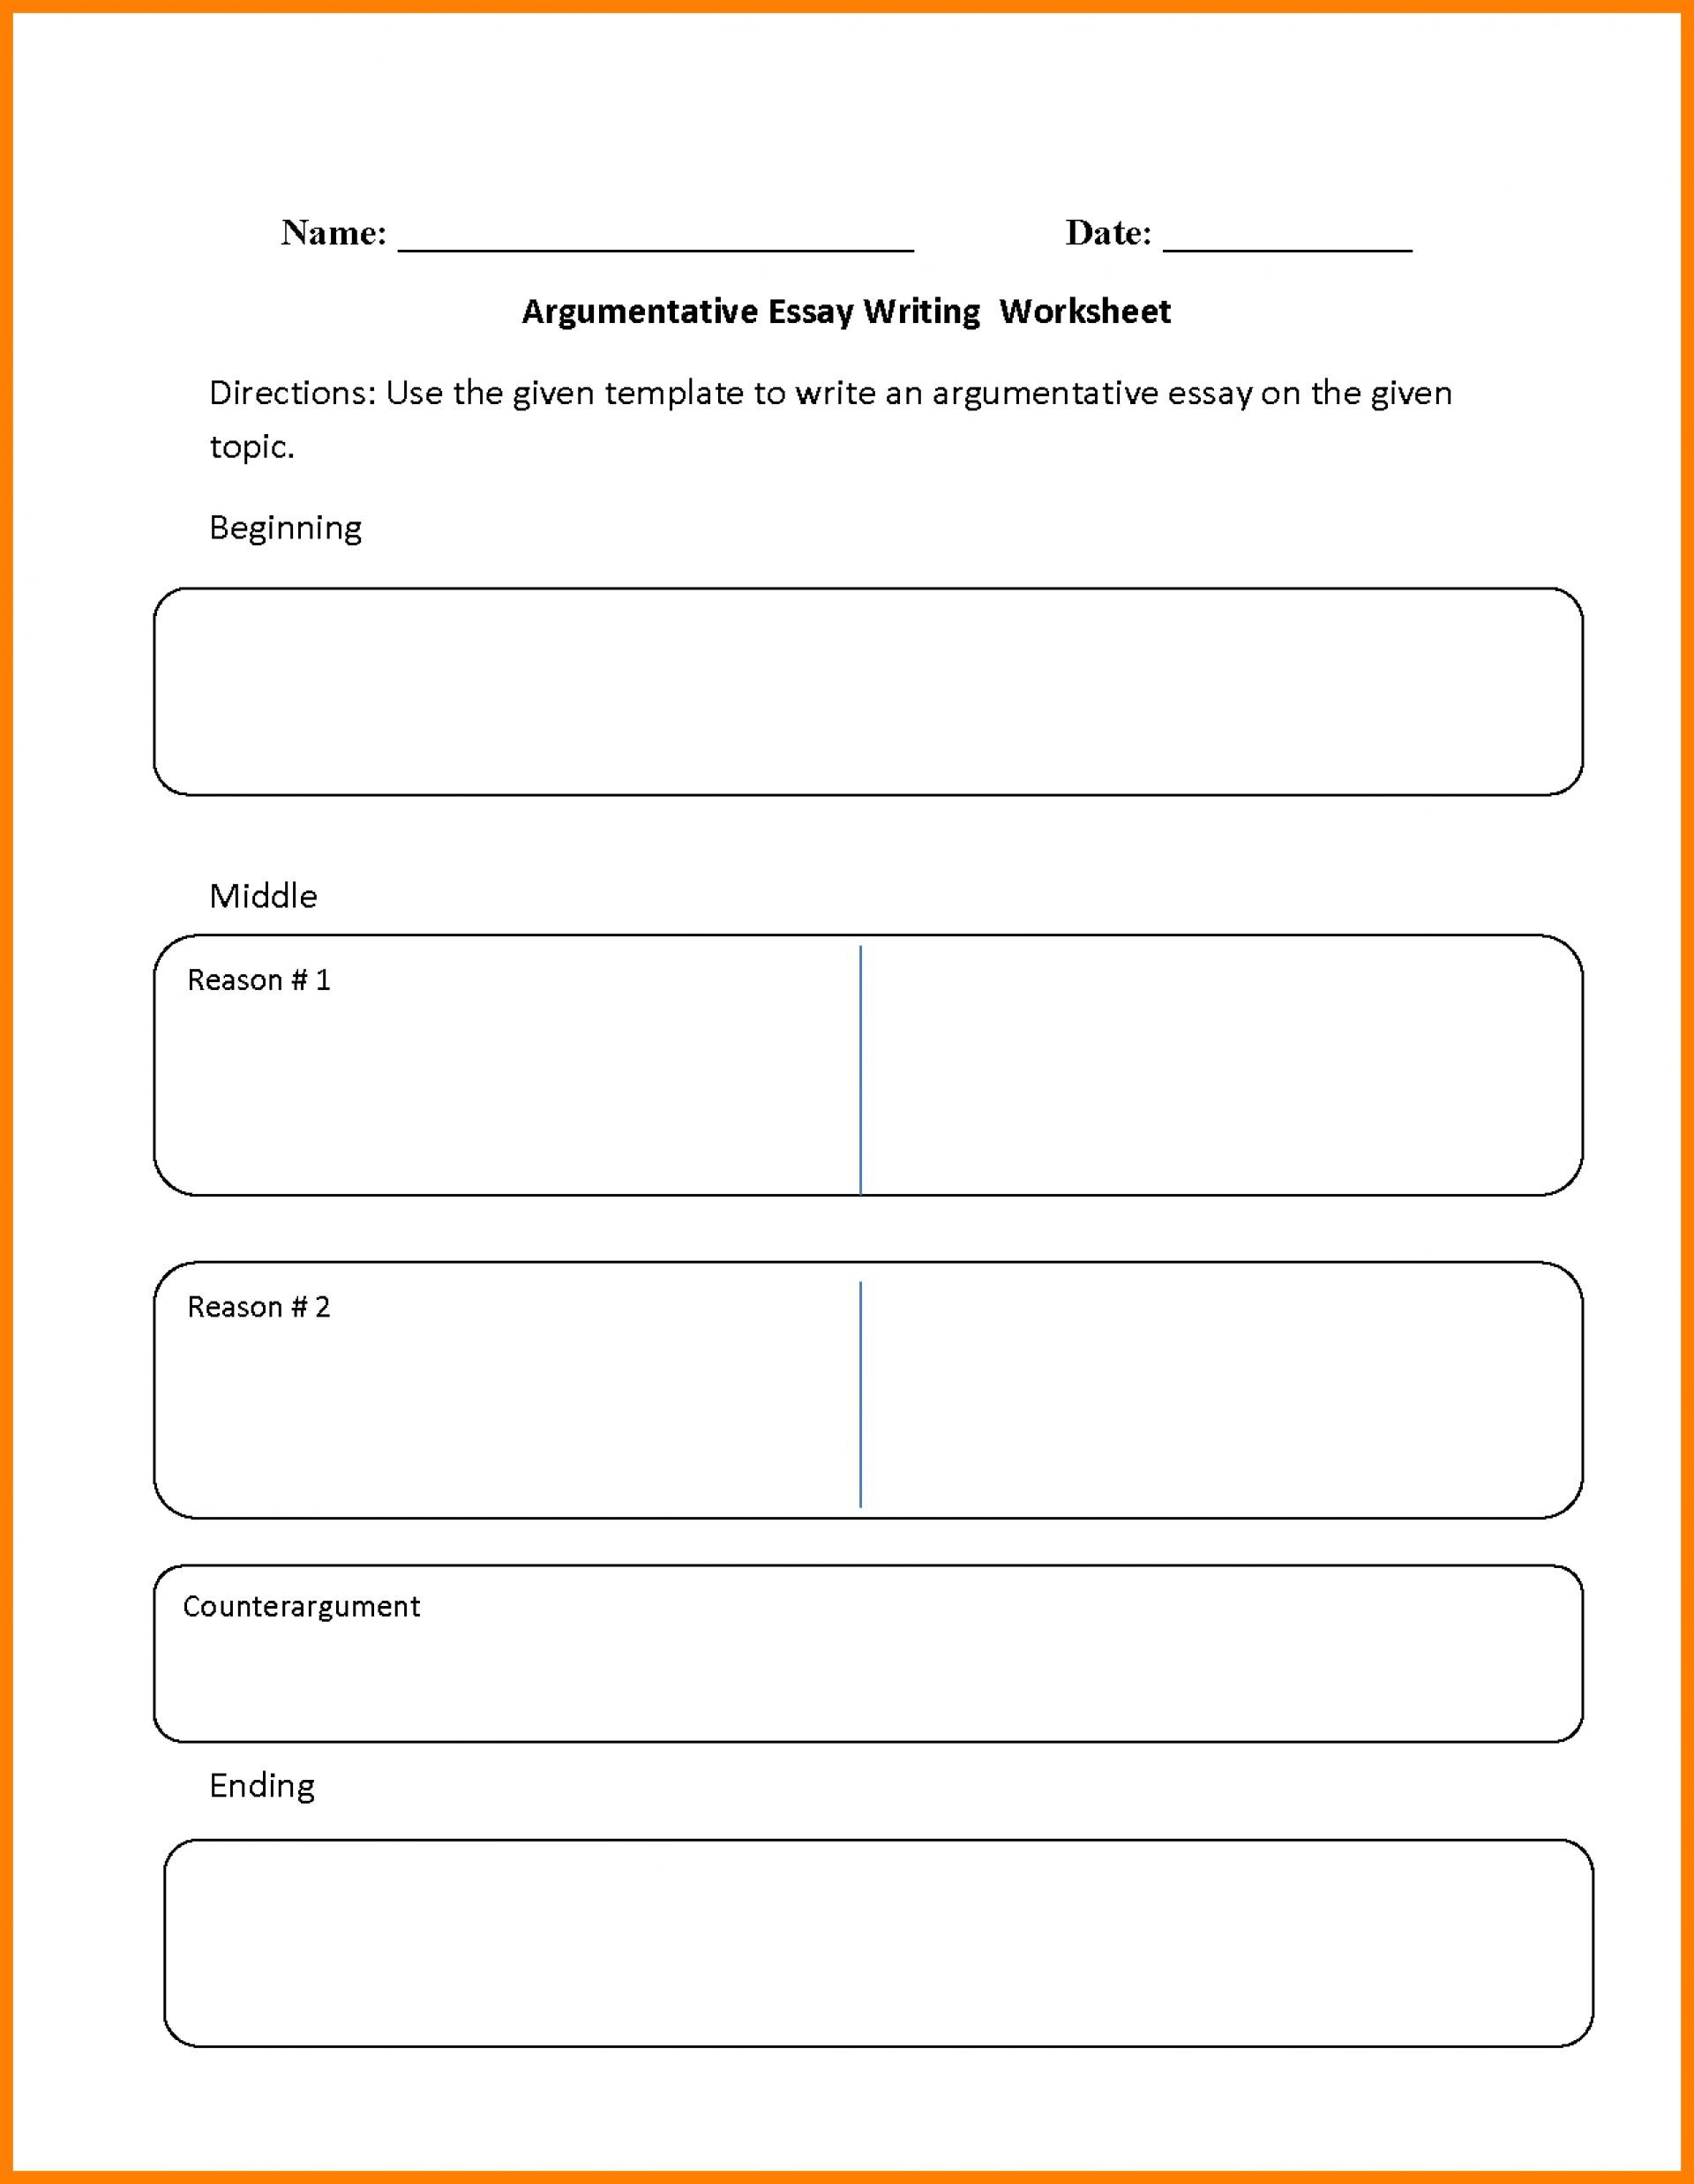 005 Writing An Opinion Essay Creative Tasks 1